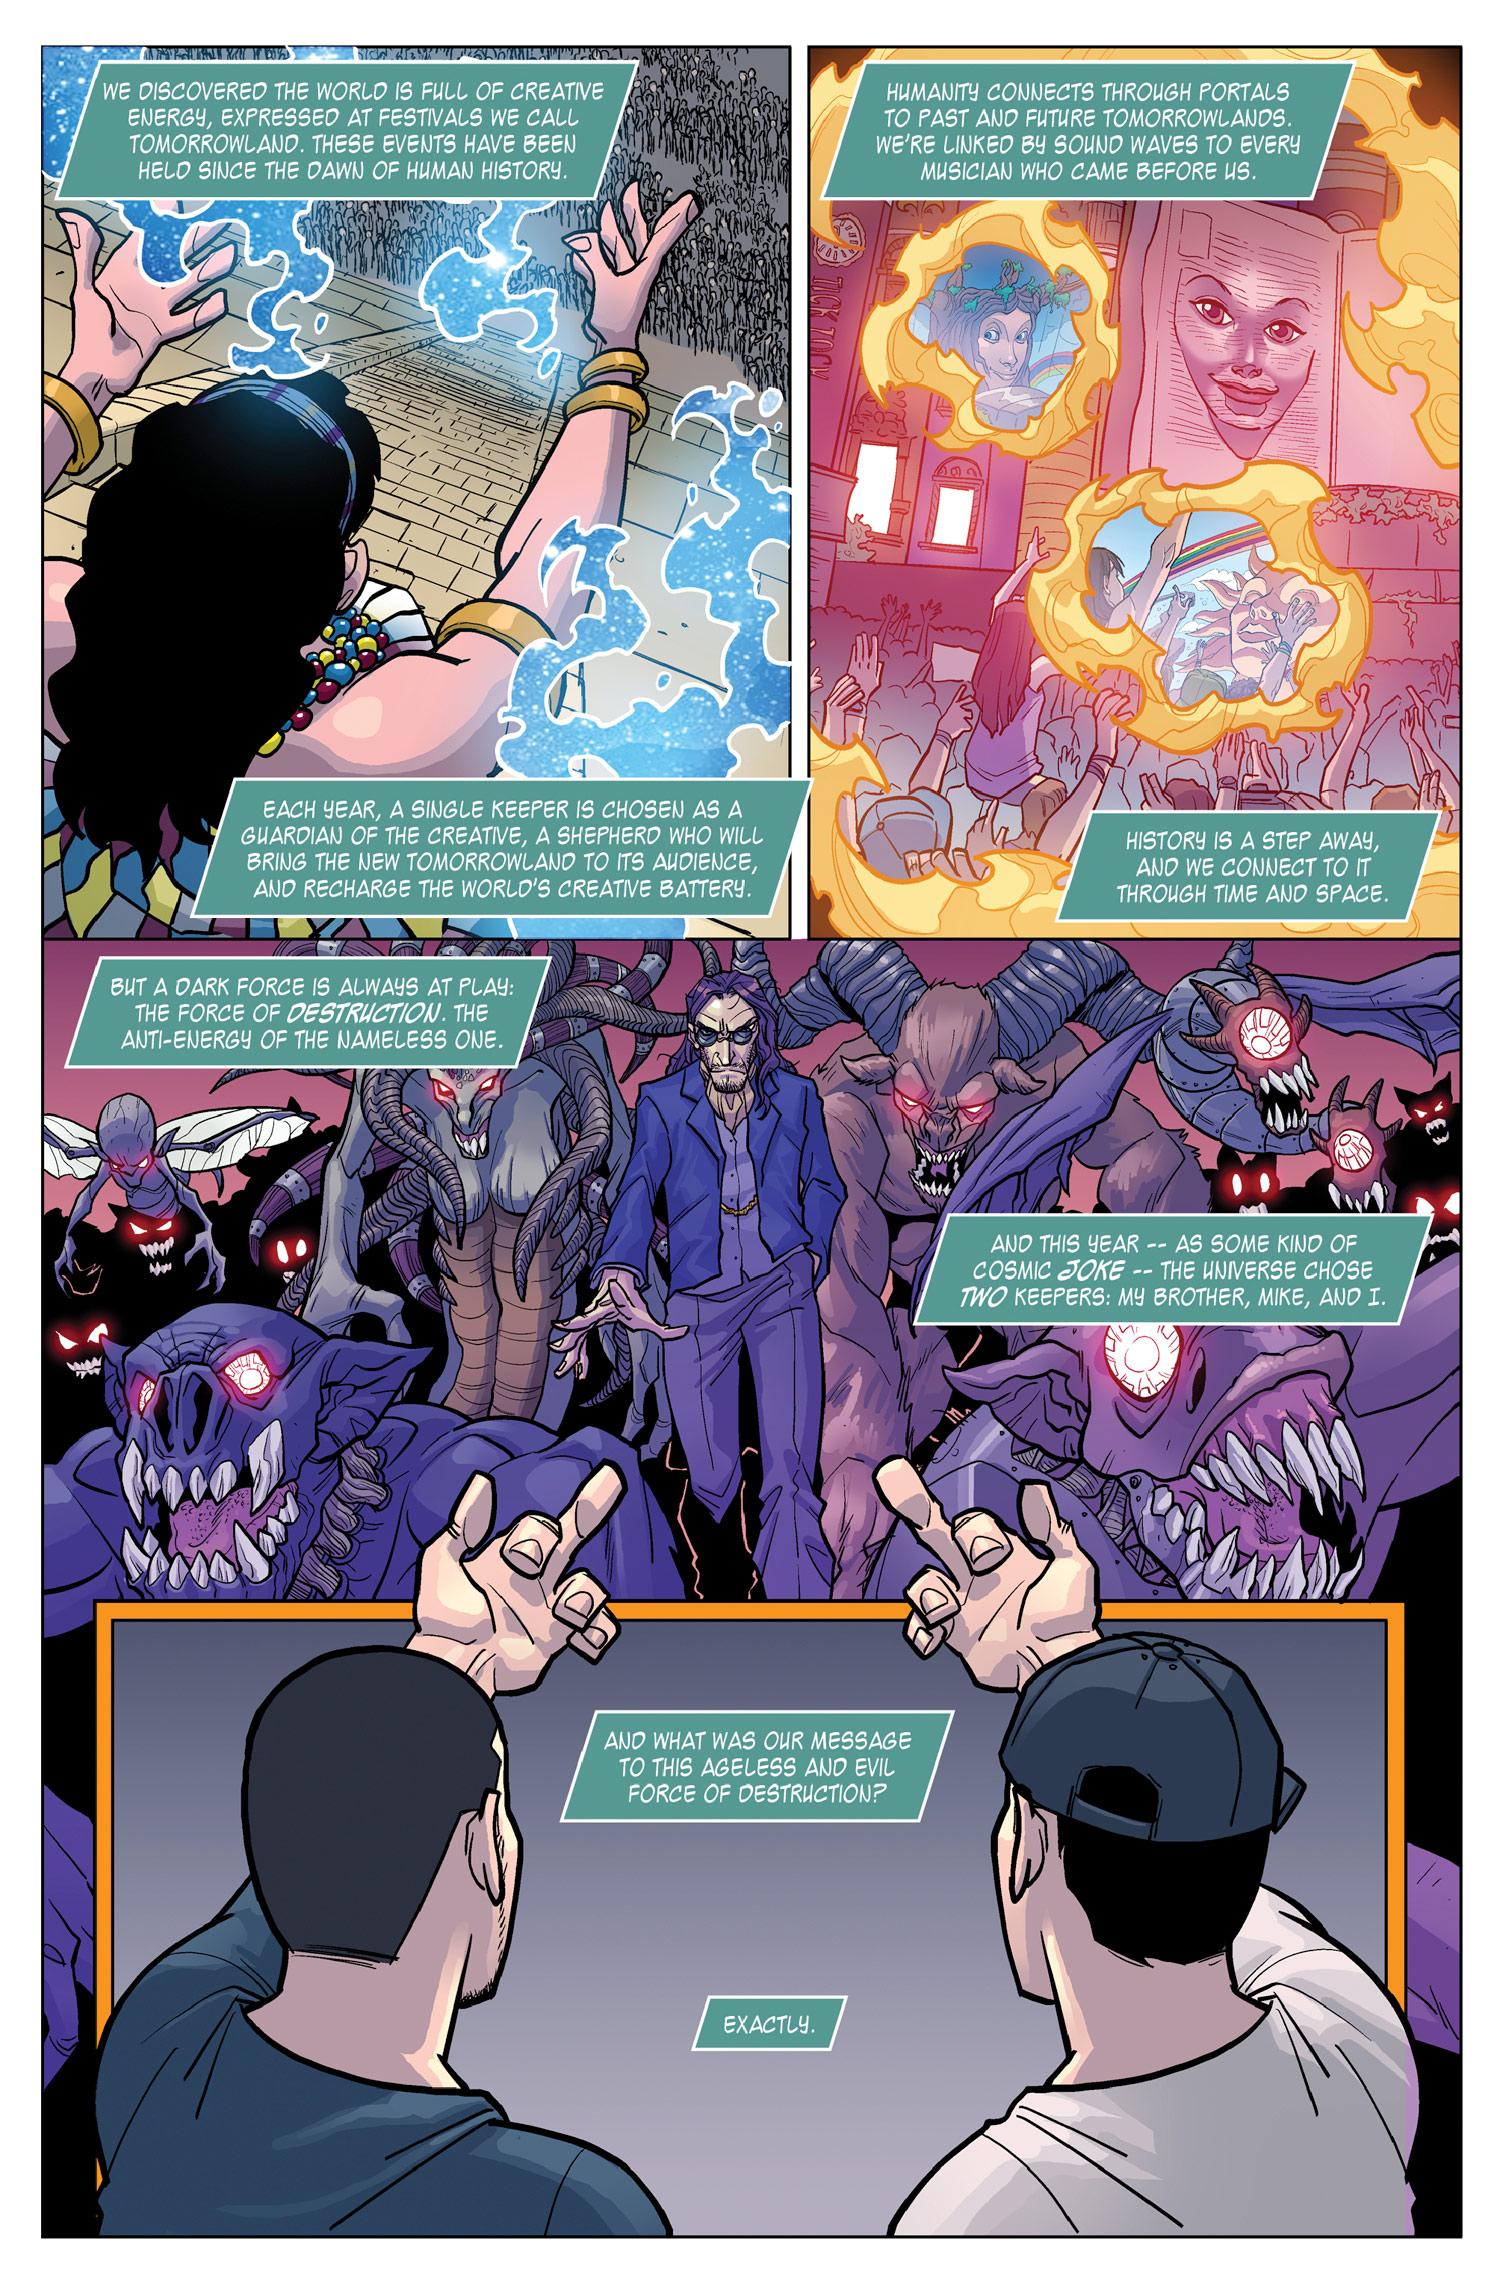 Archie comics archie comics sneak peek of the week major spoilers - Tomorrowland_3_cover_color_130401 1 Tomorrow3_sample2web Tomorrow3_sample3web Tomorrow3_sample4web Tomorrow3_sampleweb Via Titan Comics